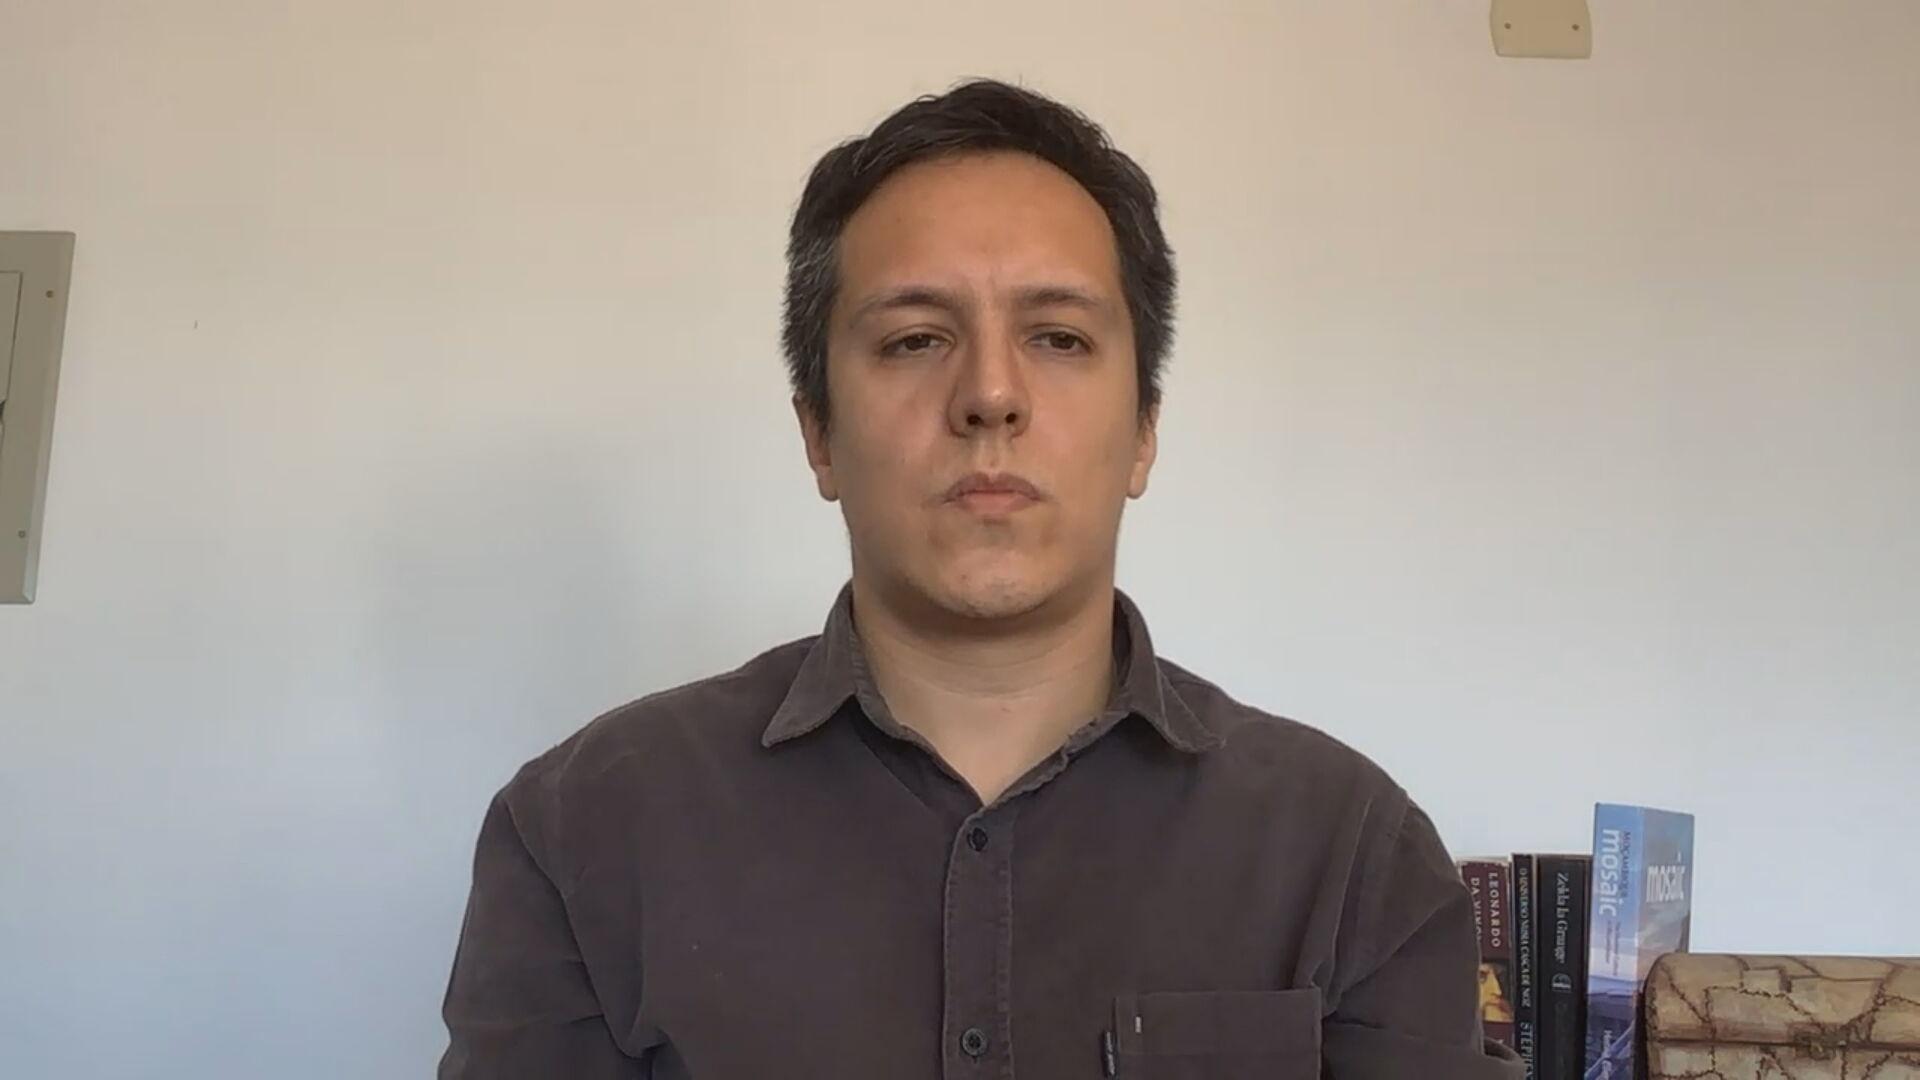 Infectologista Antônio Flores (09 de maio de 2021)